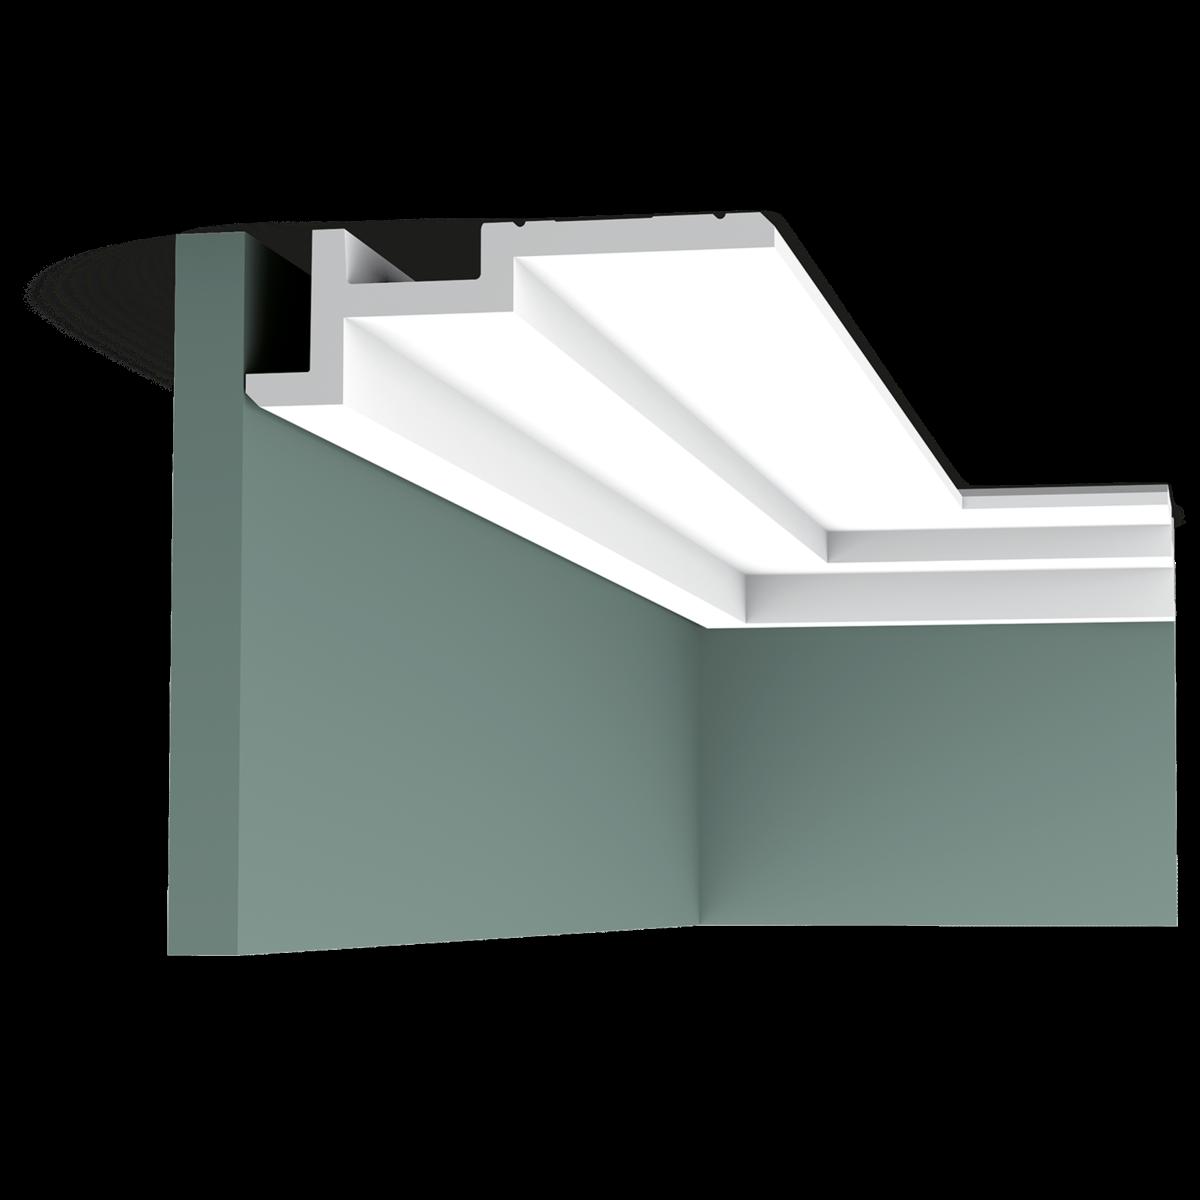 corniche clairage plafond led murale c396 orac decor magasin paris. Black Bedroom Furniture Sets. Home Design Ideas